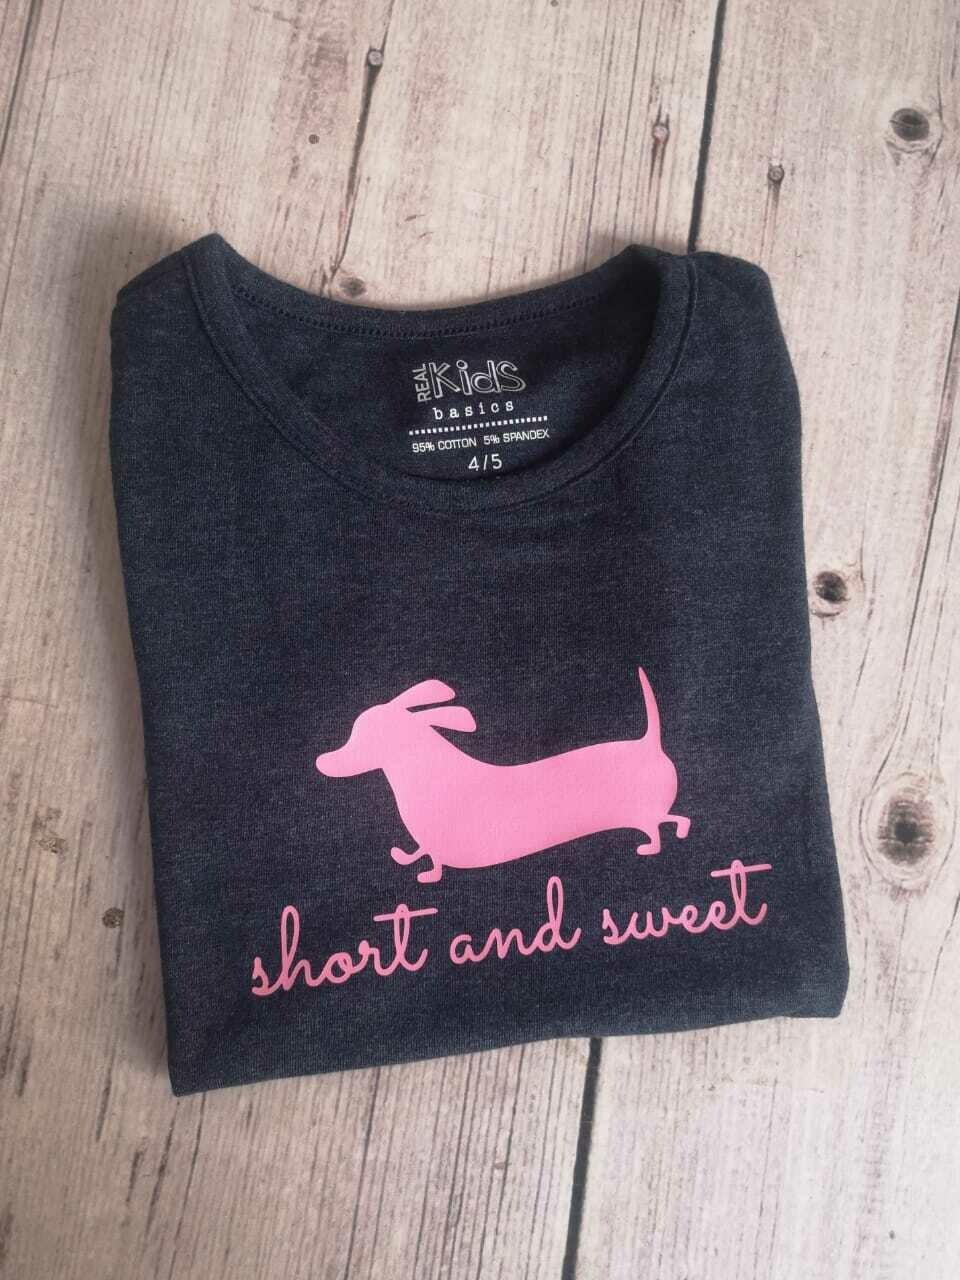 Girls T-Shirt - Short and Sweet